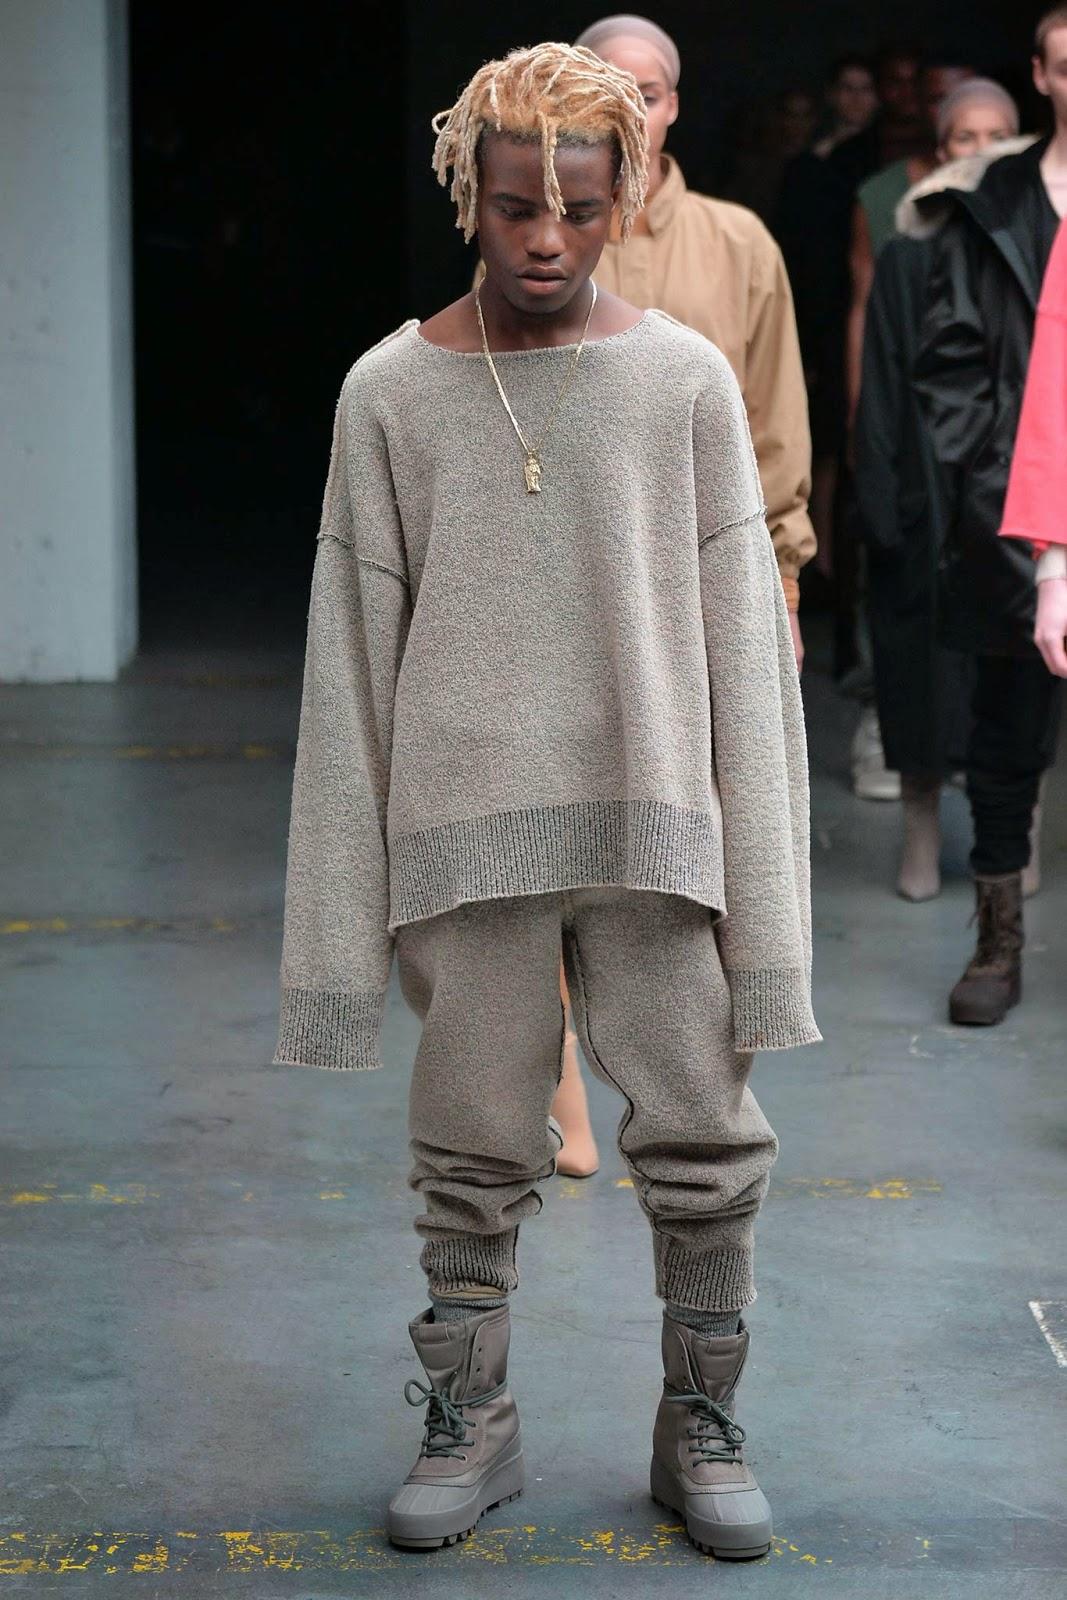 Kanye West Wearing Haider Ackermann Sweatpants And Adidas